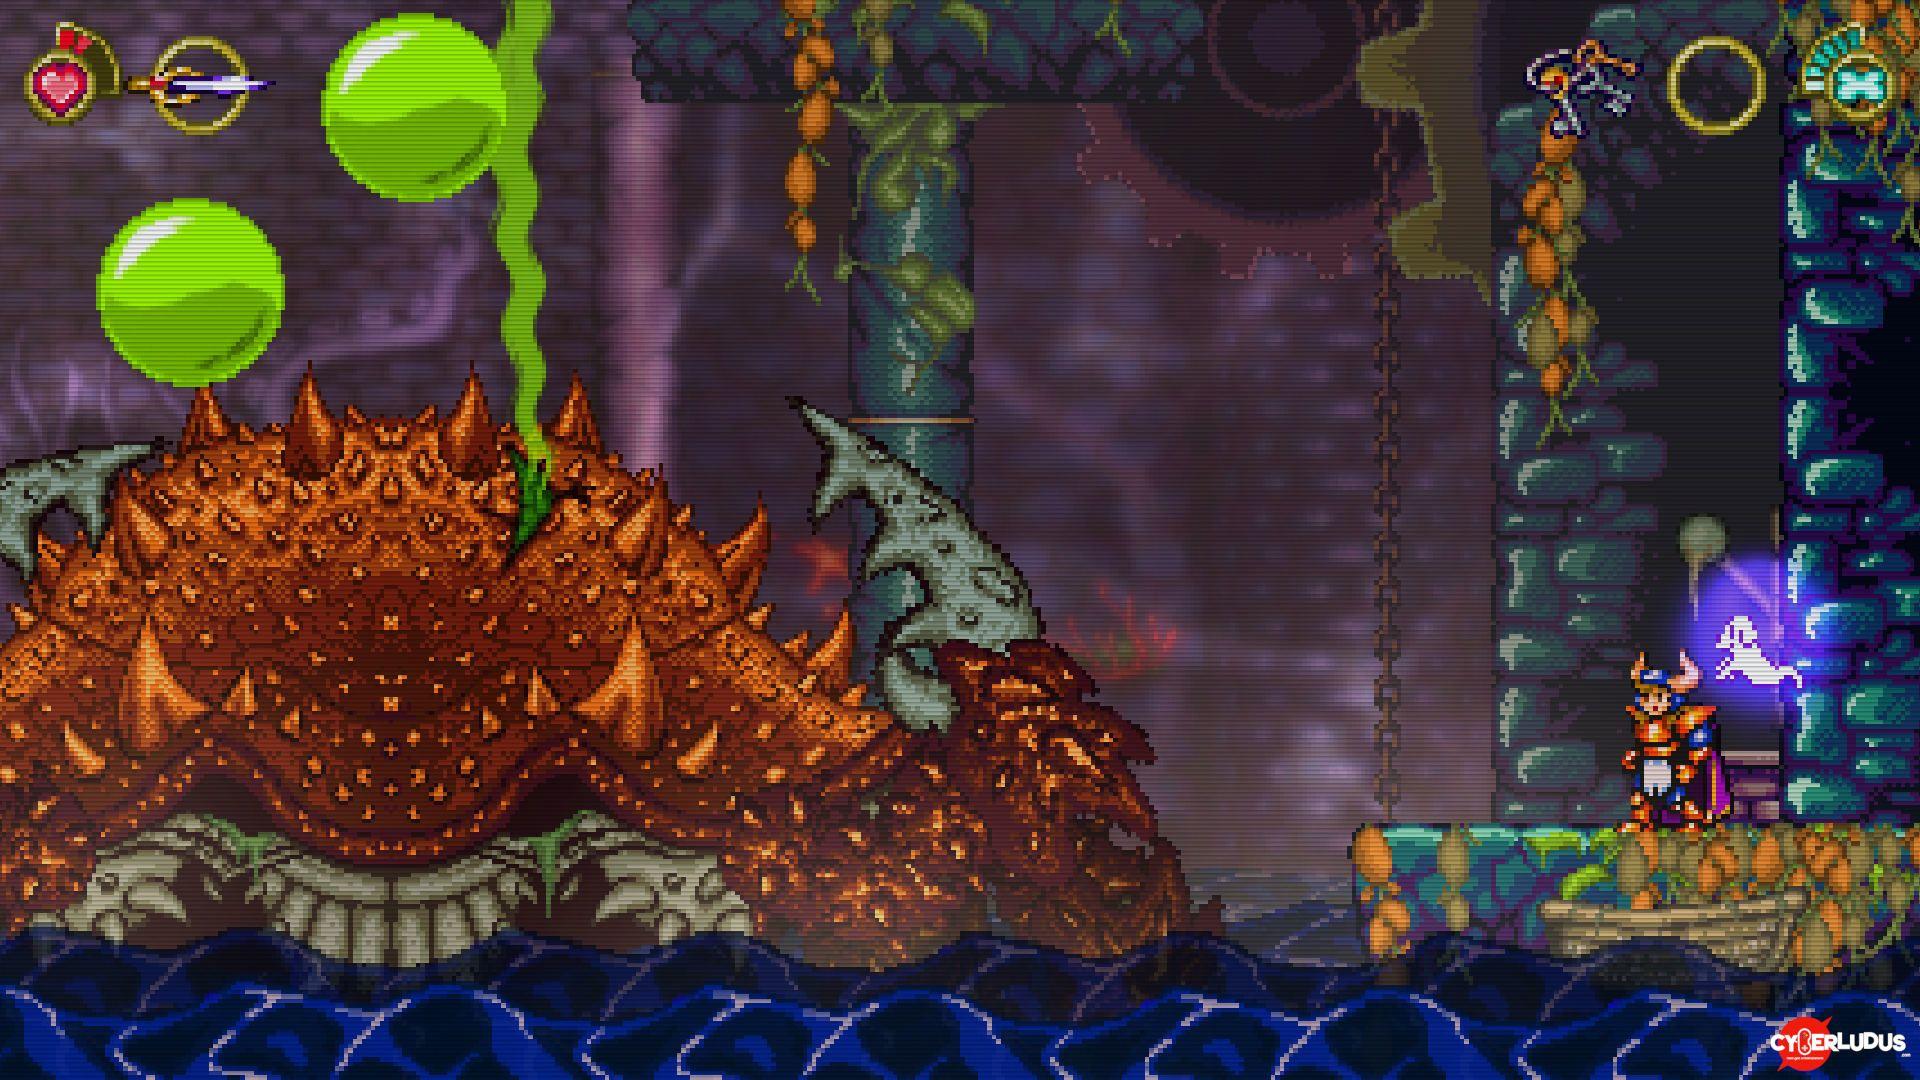 Battle-Princess-Madelyn-boss-crab